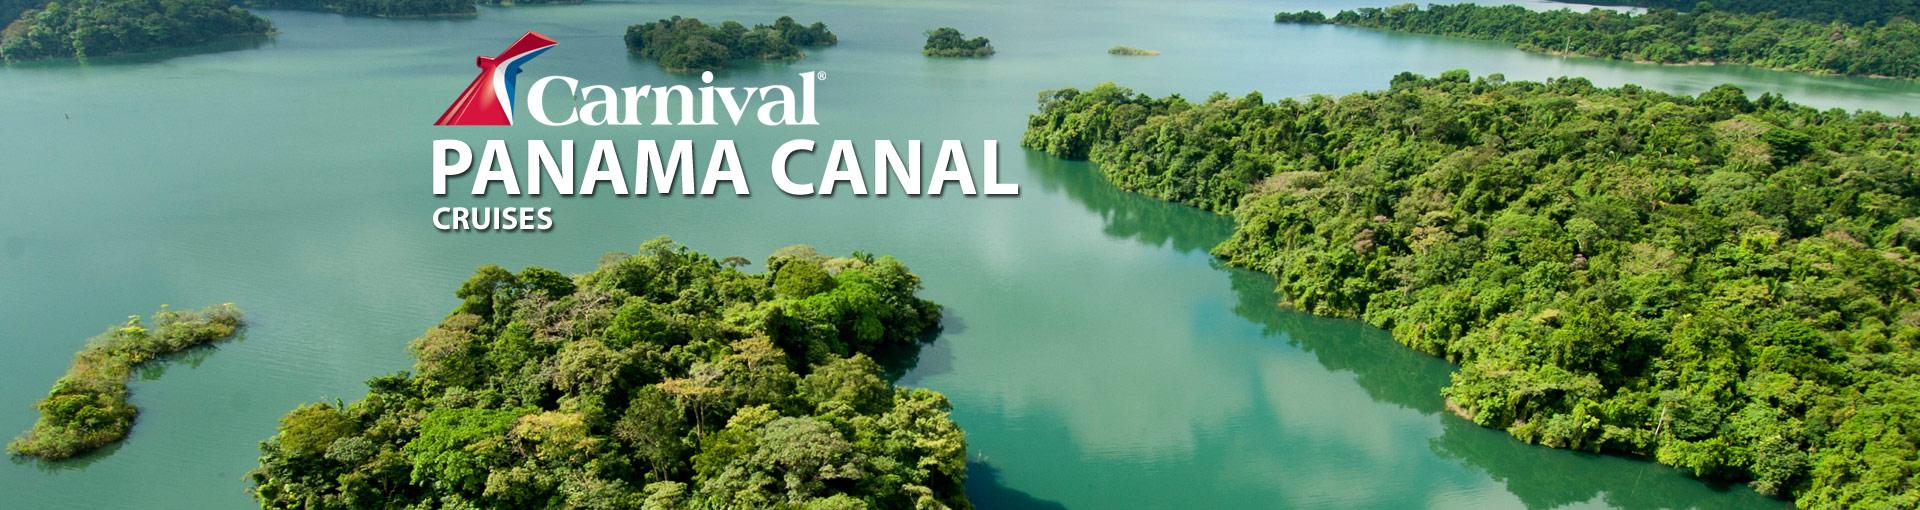 Carnival Cruise Lines Panama Canal Cruises